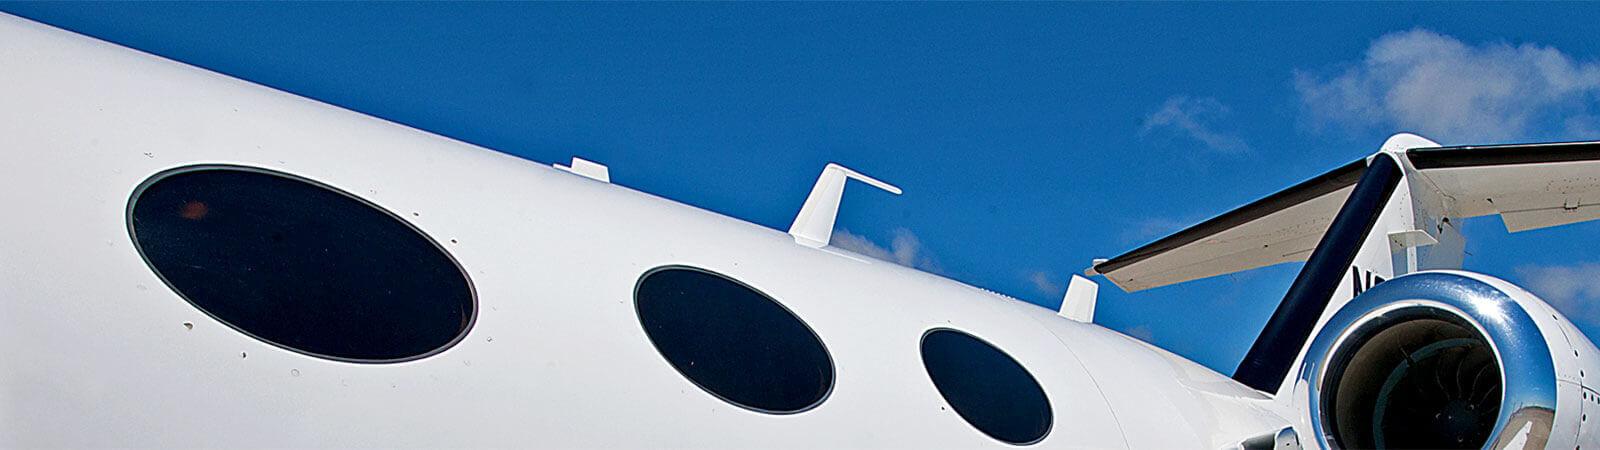 Pacific Coast Jet